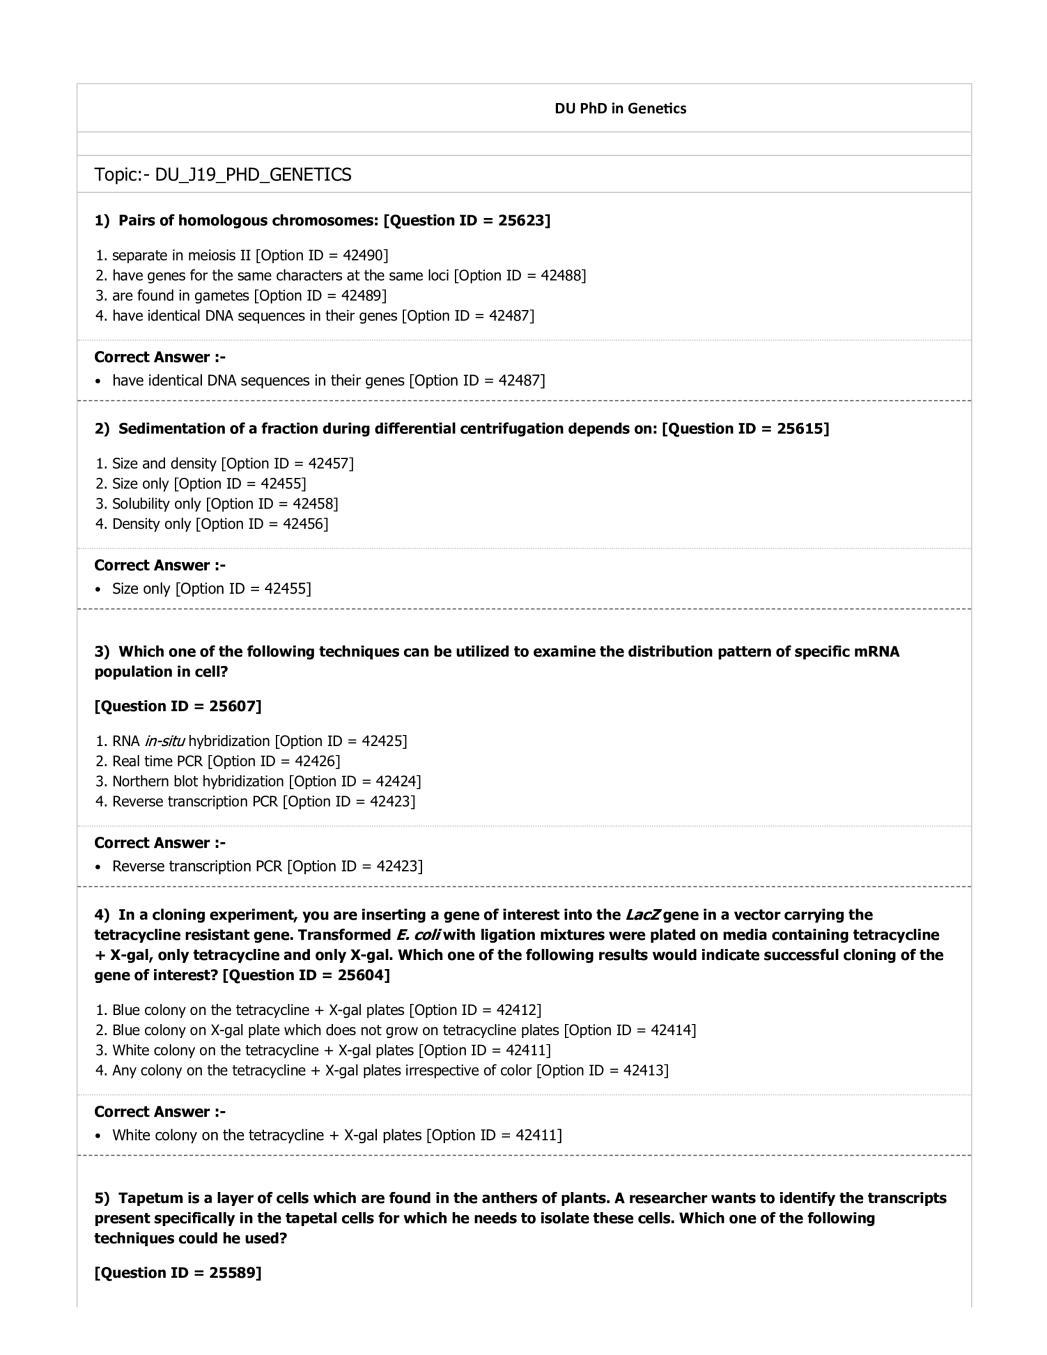 DUET Question Paper 2019 for M.Phil Ph.D Genetics - Page 1